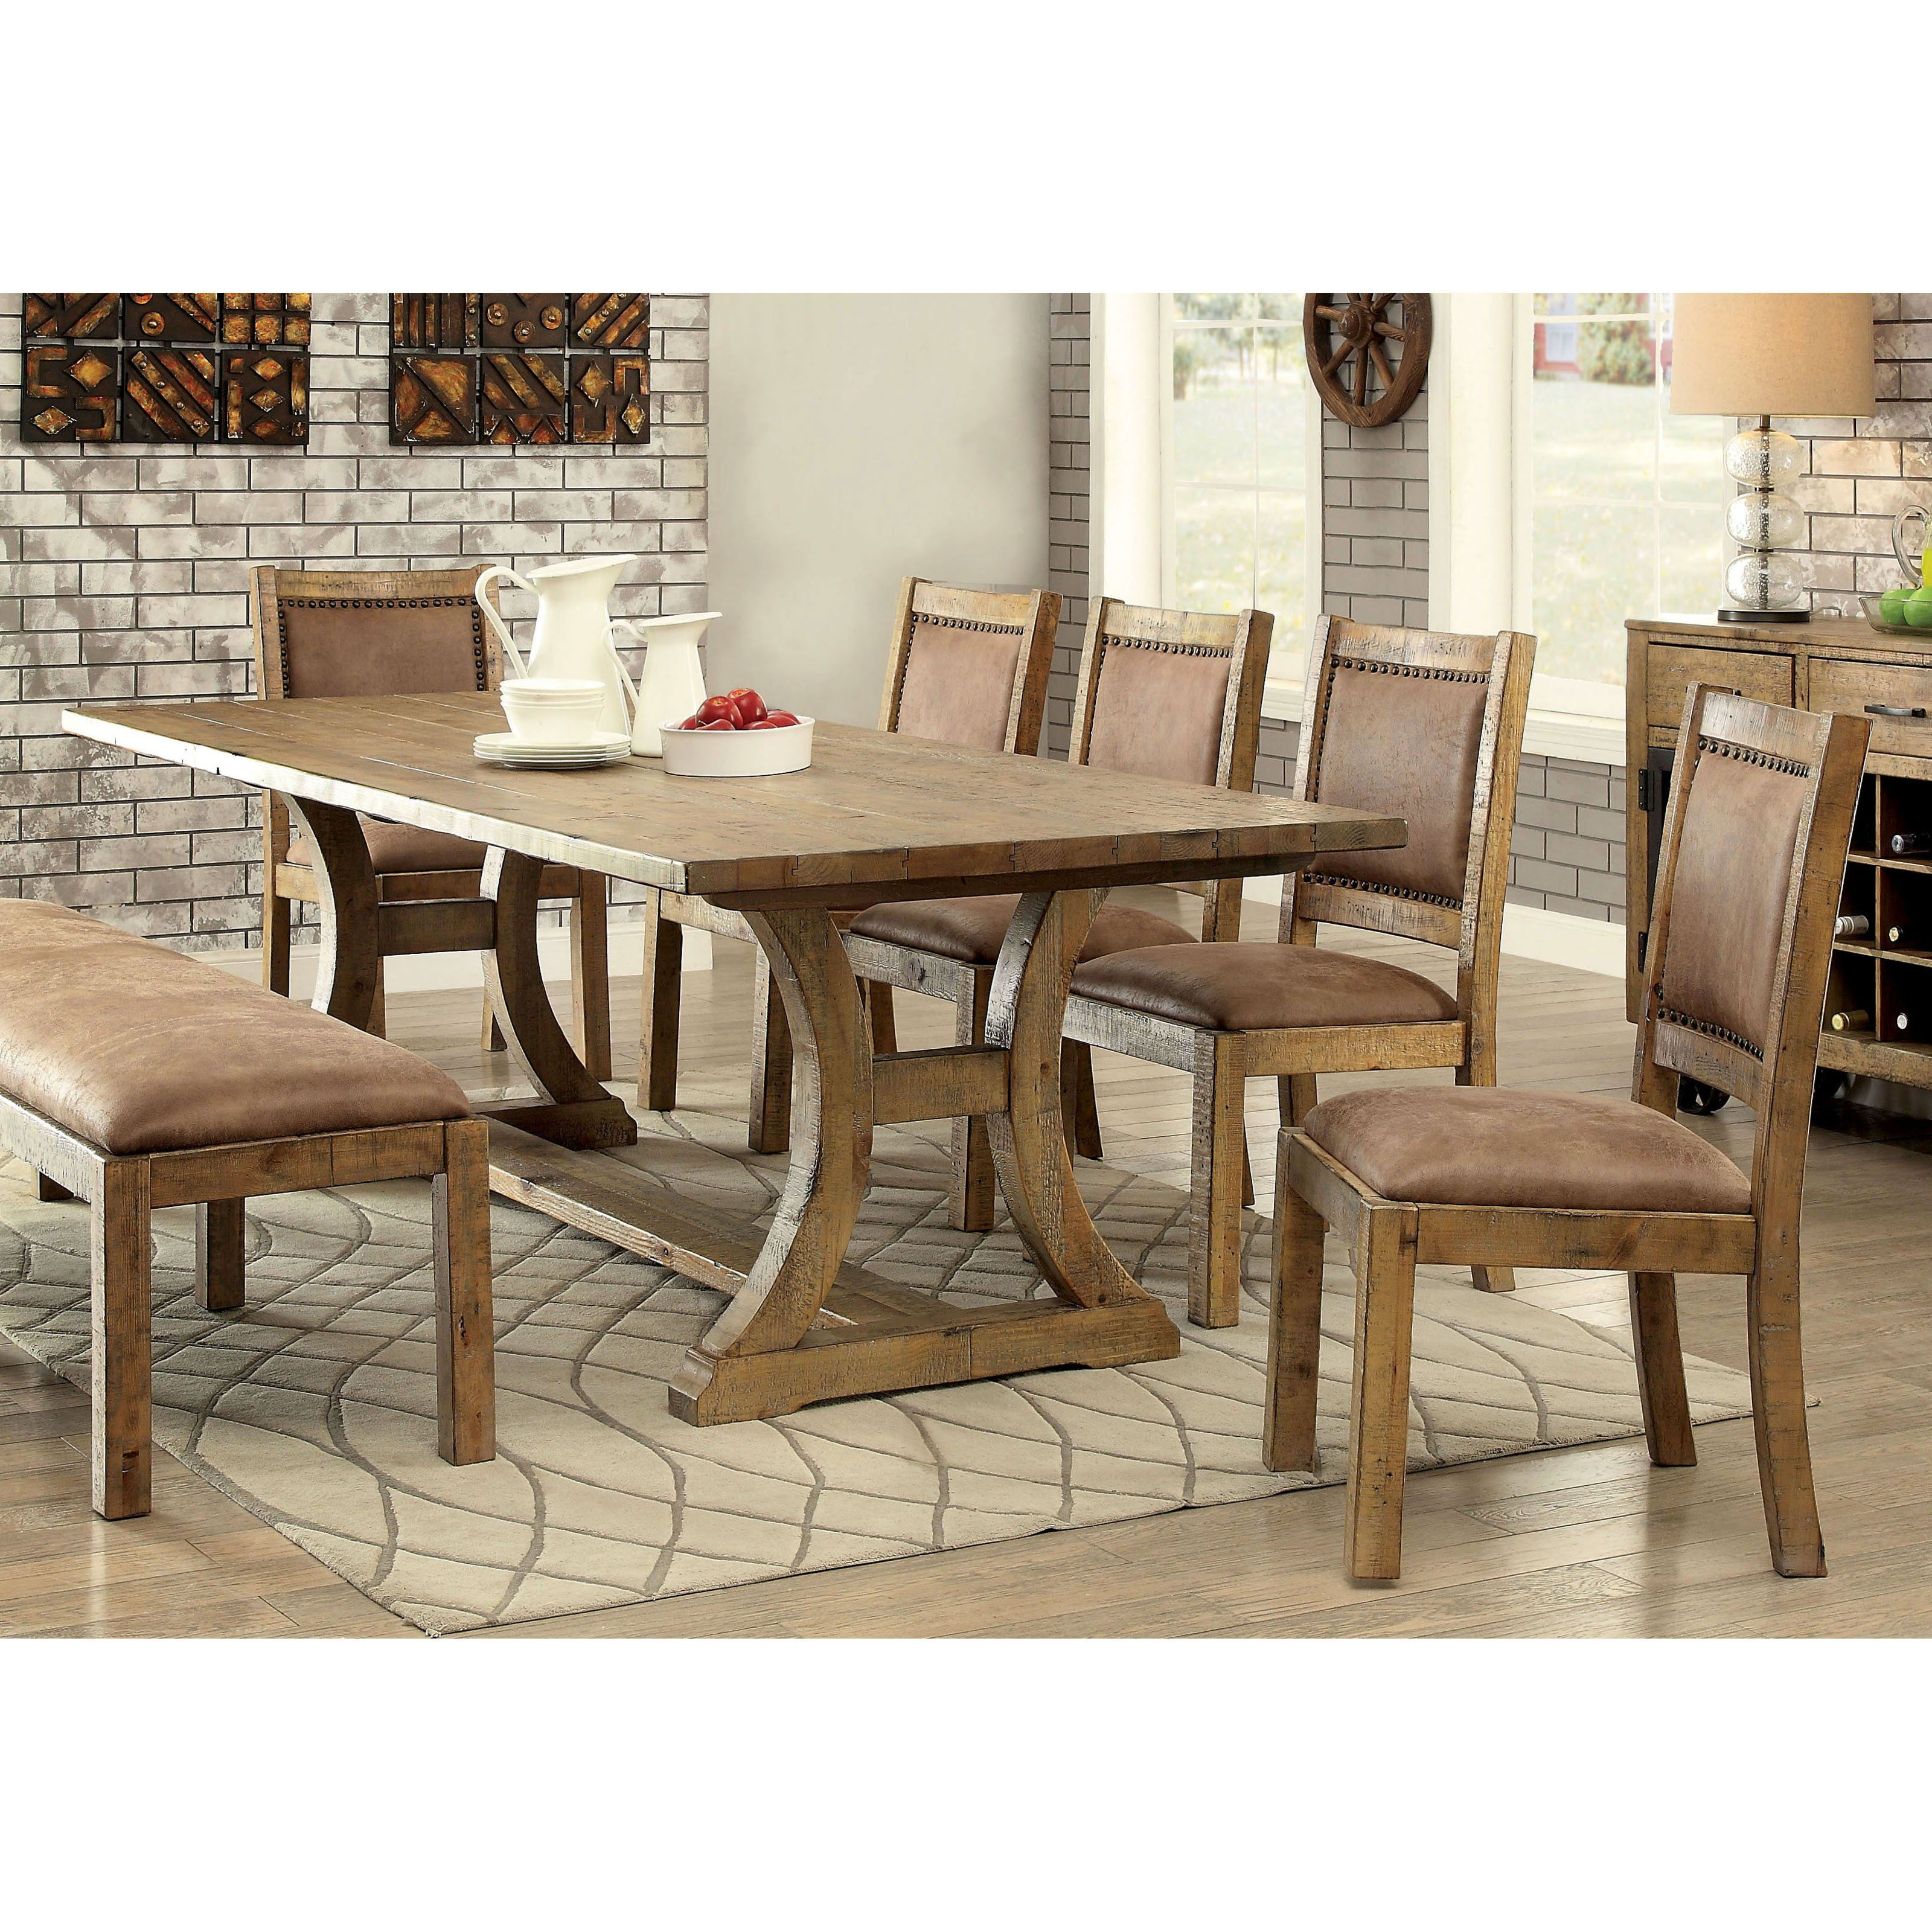 Furniture Of America Camen 6 Piece Dining Set  Idf 3829T 6Pc -